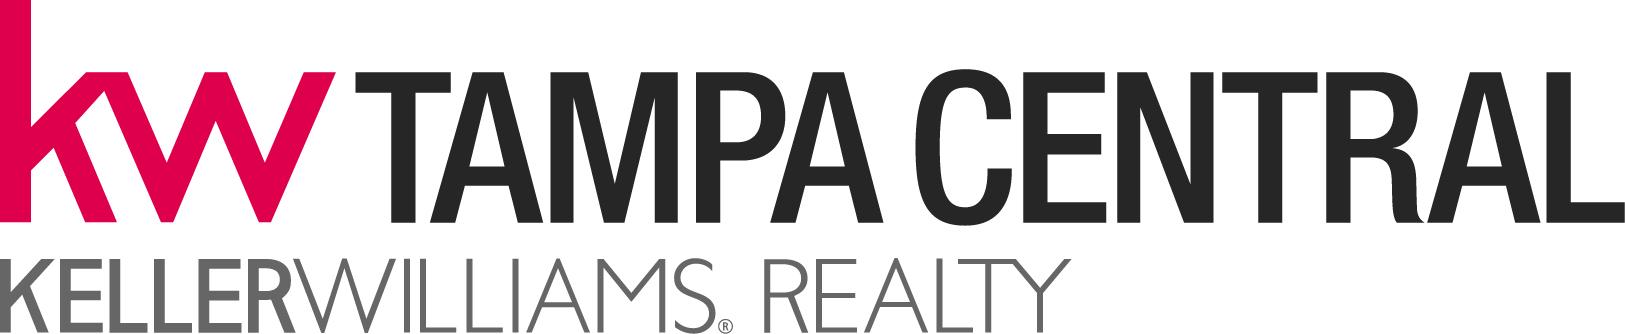 Keller Williams Tampa Central logo